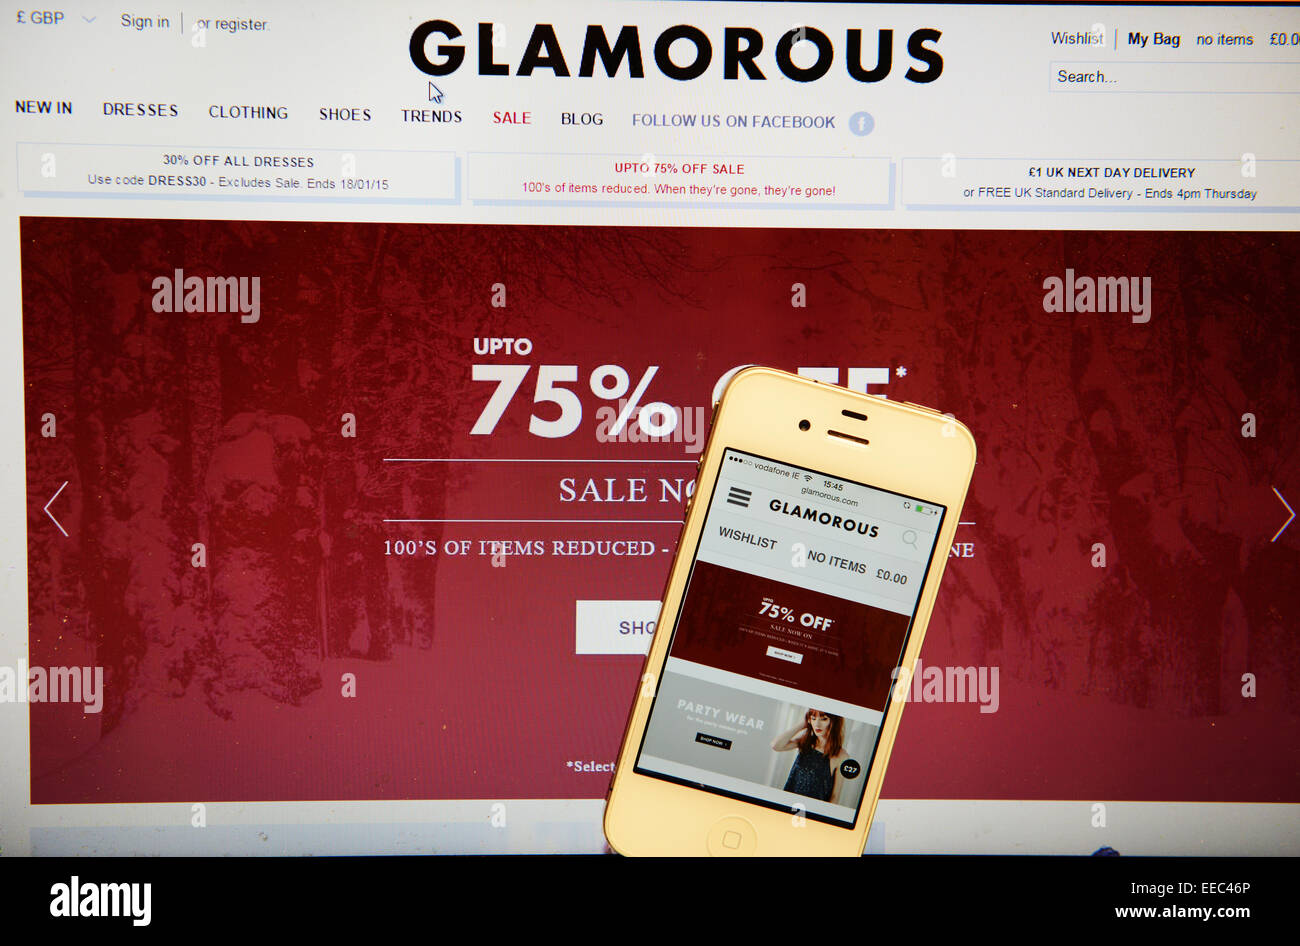 Glamorous Website and IPhone - Stock Image